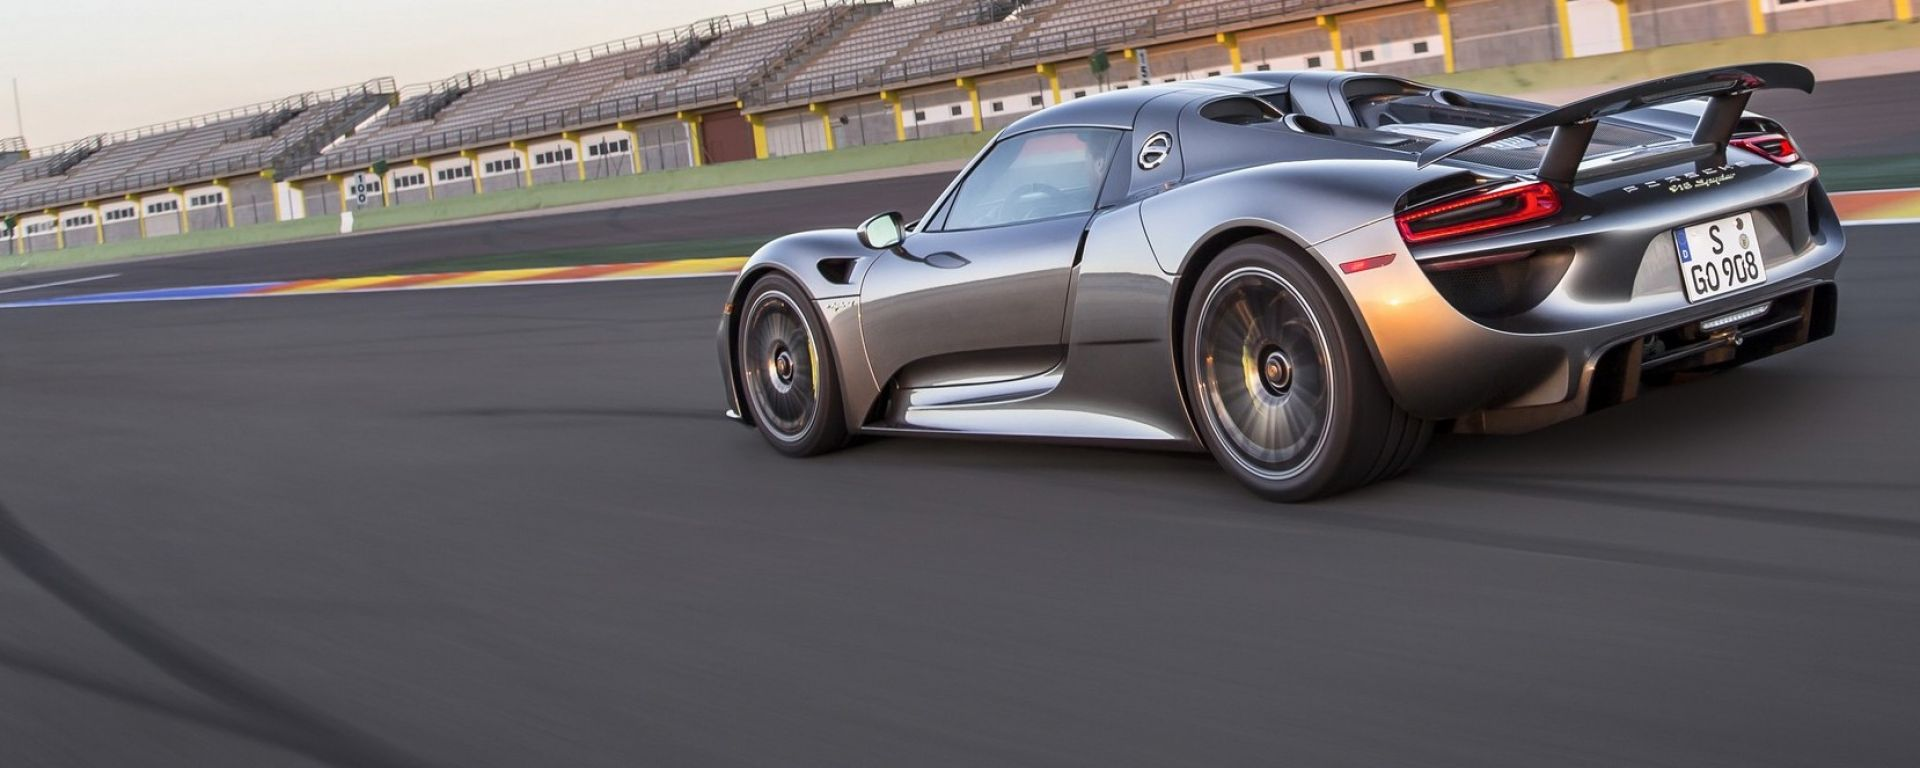 Porsche 918 Spyder, invecchiando accusa dolori al telaio